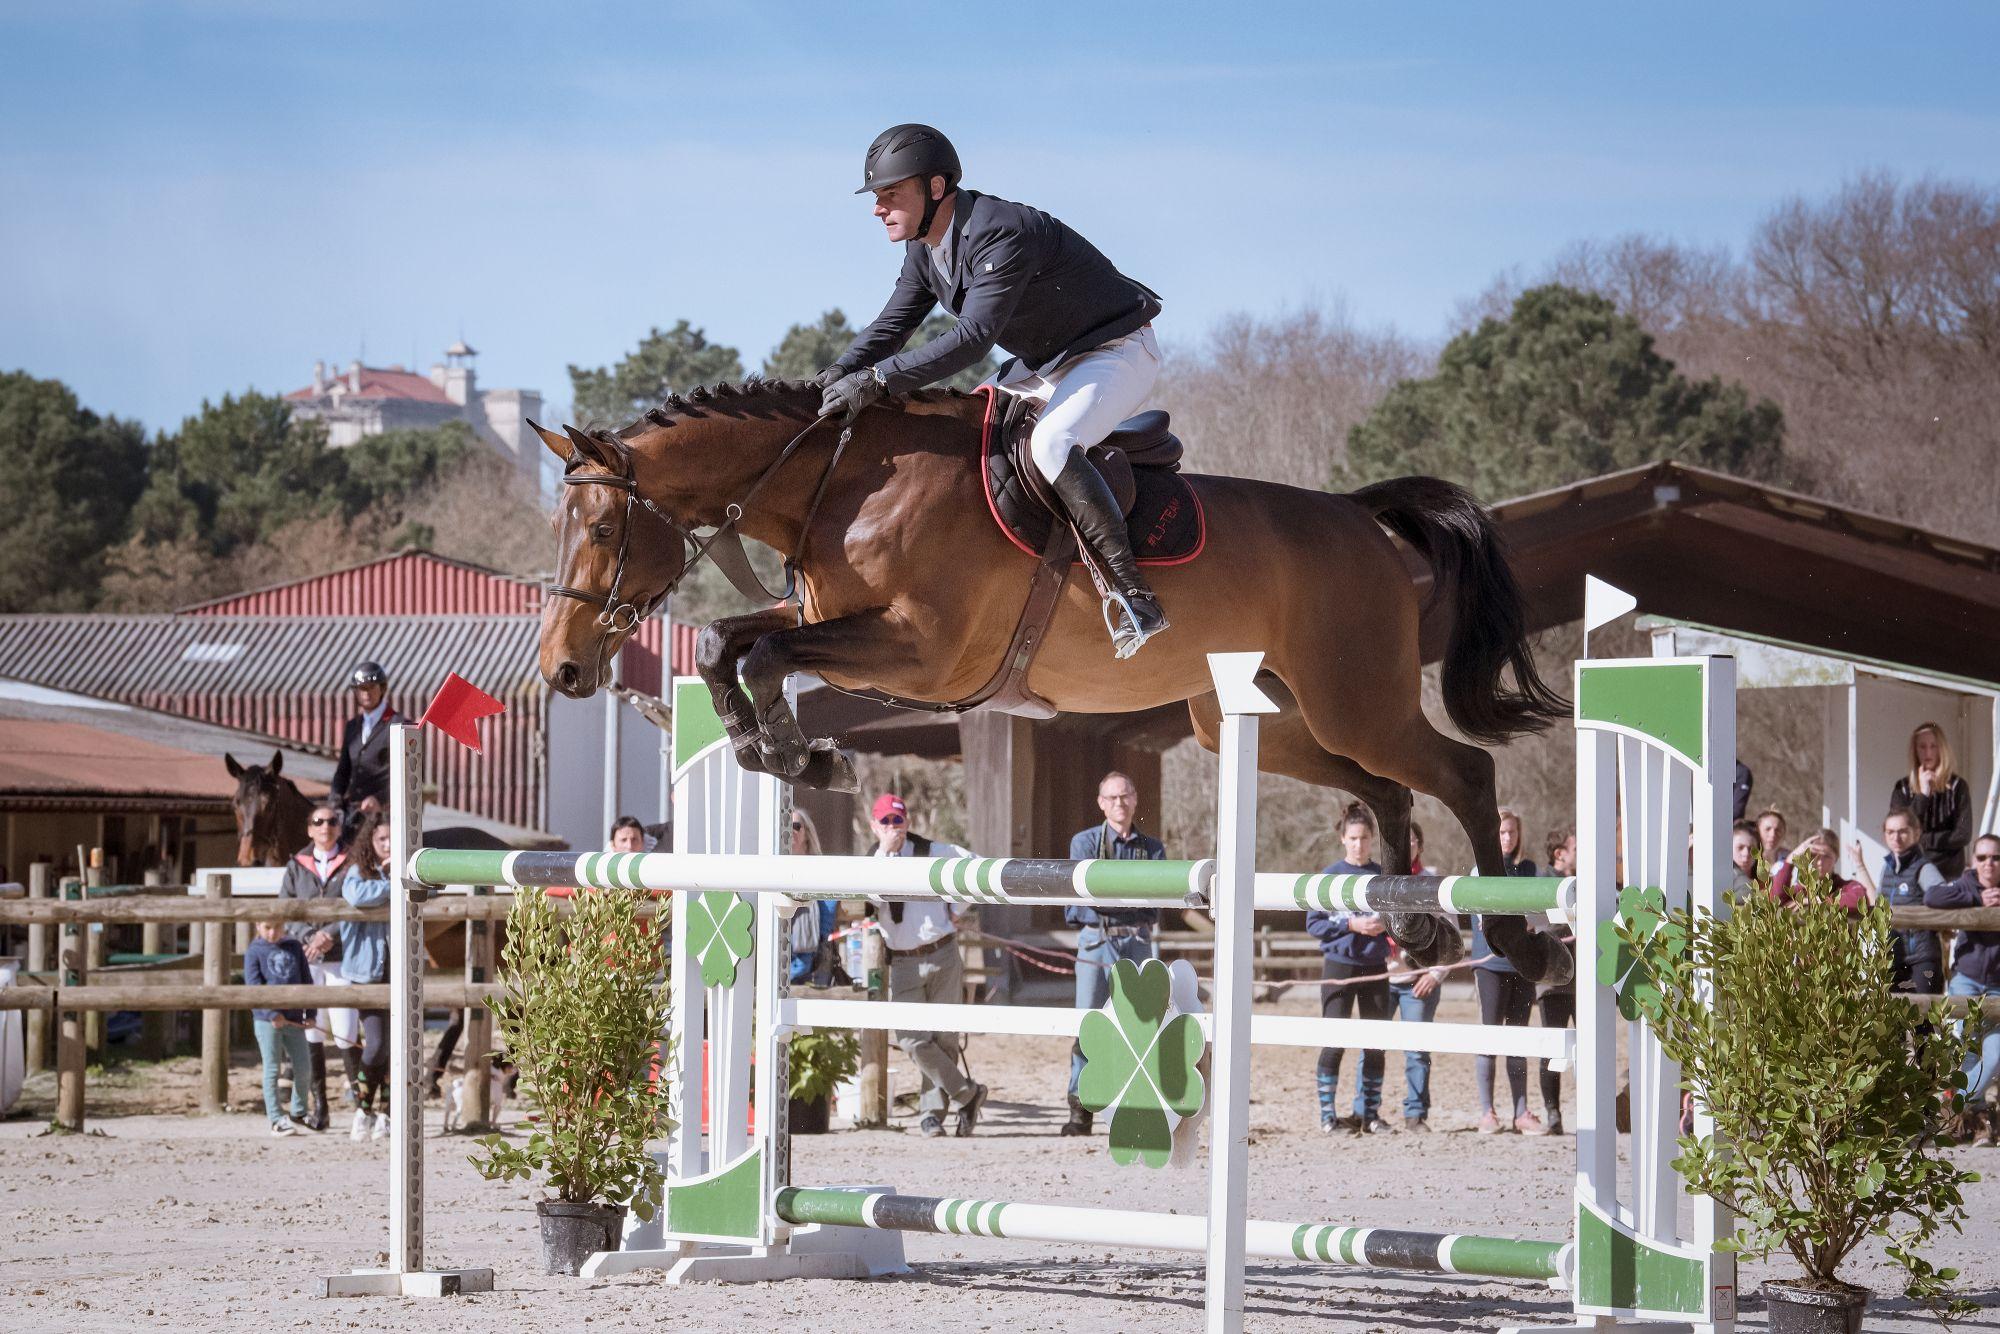 diamanti-van-de-helle-z-las-jump-biarritz-show-jumping-horses-feb-23-rd-2019-4